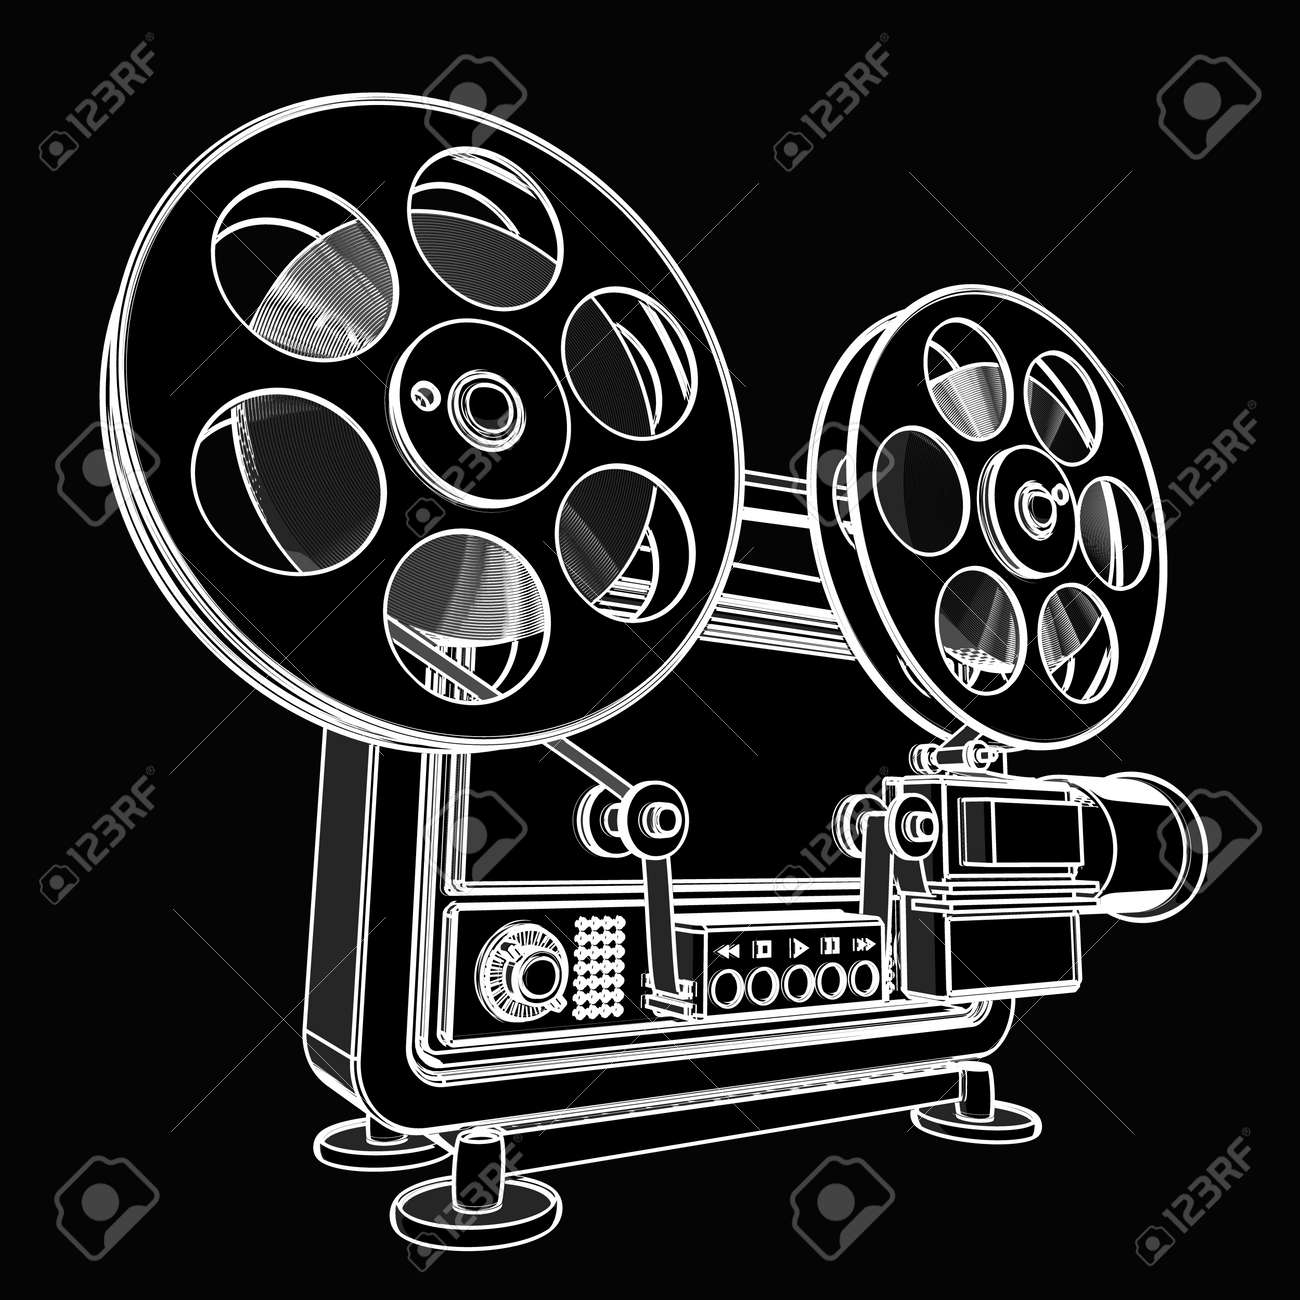 Old Fashioned Cinema Projector Black Cartoon Illustration Outline